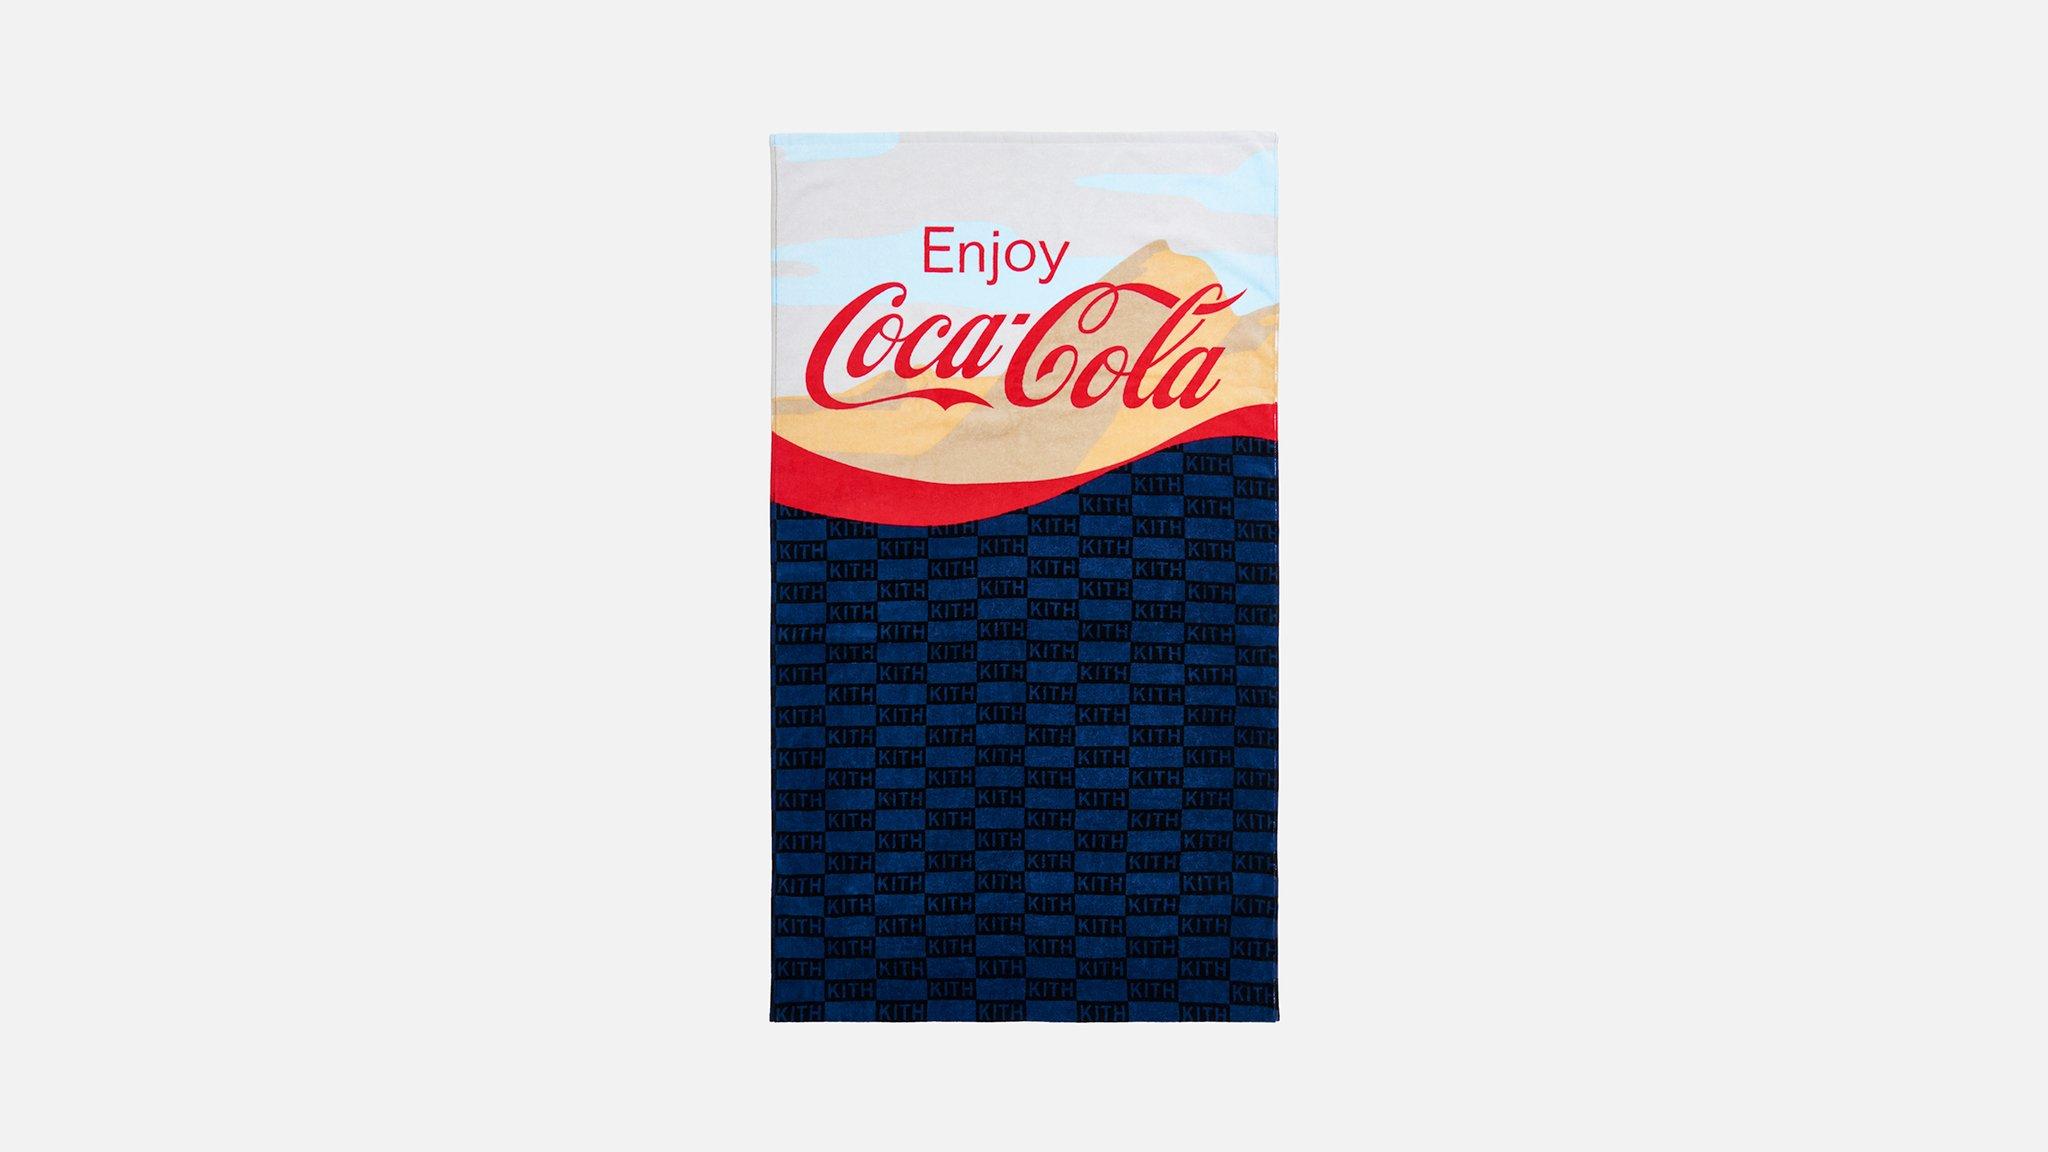 kith-coca-cola-dtf-magazine-9